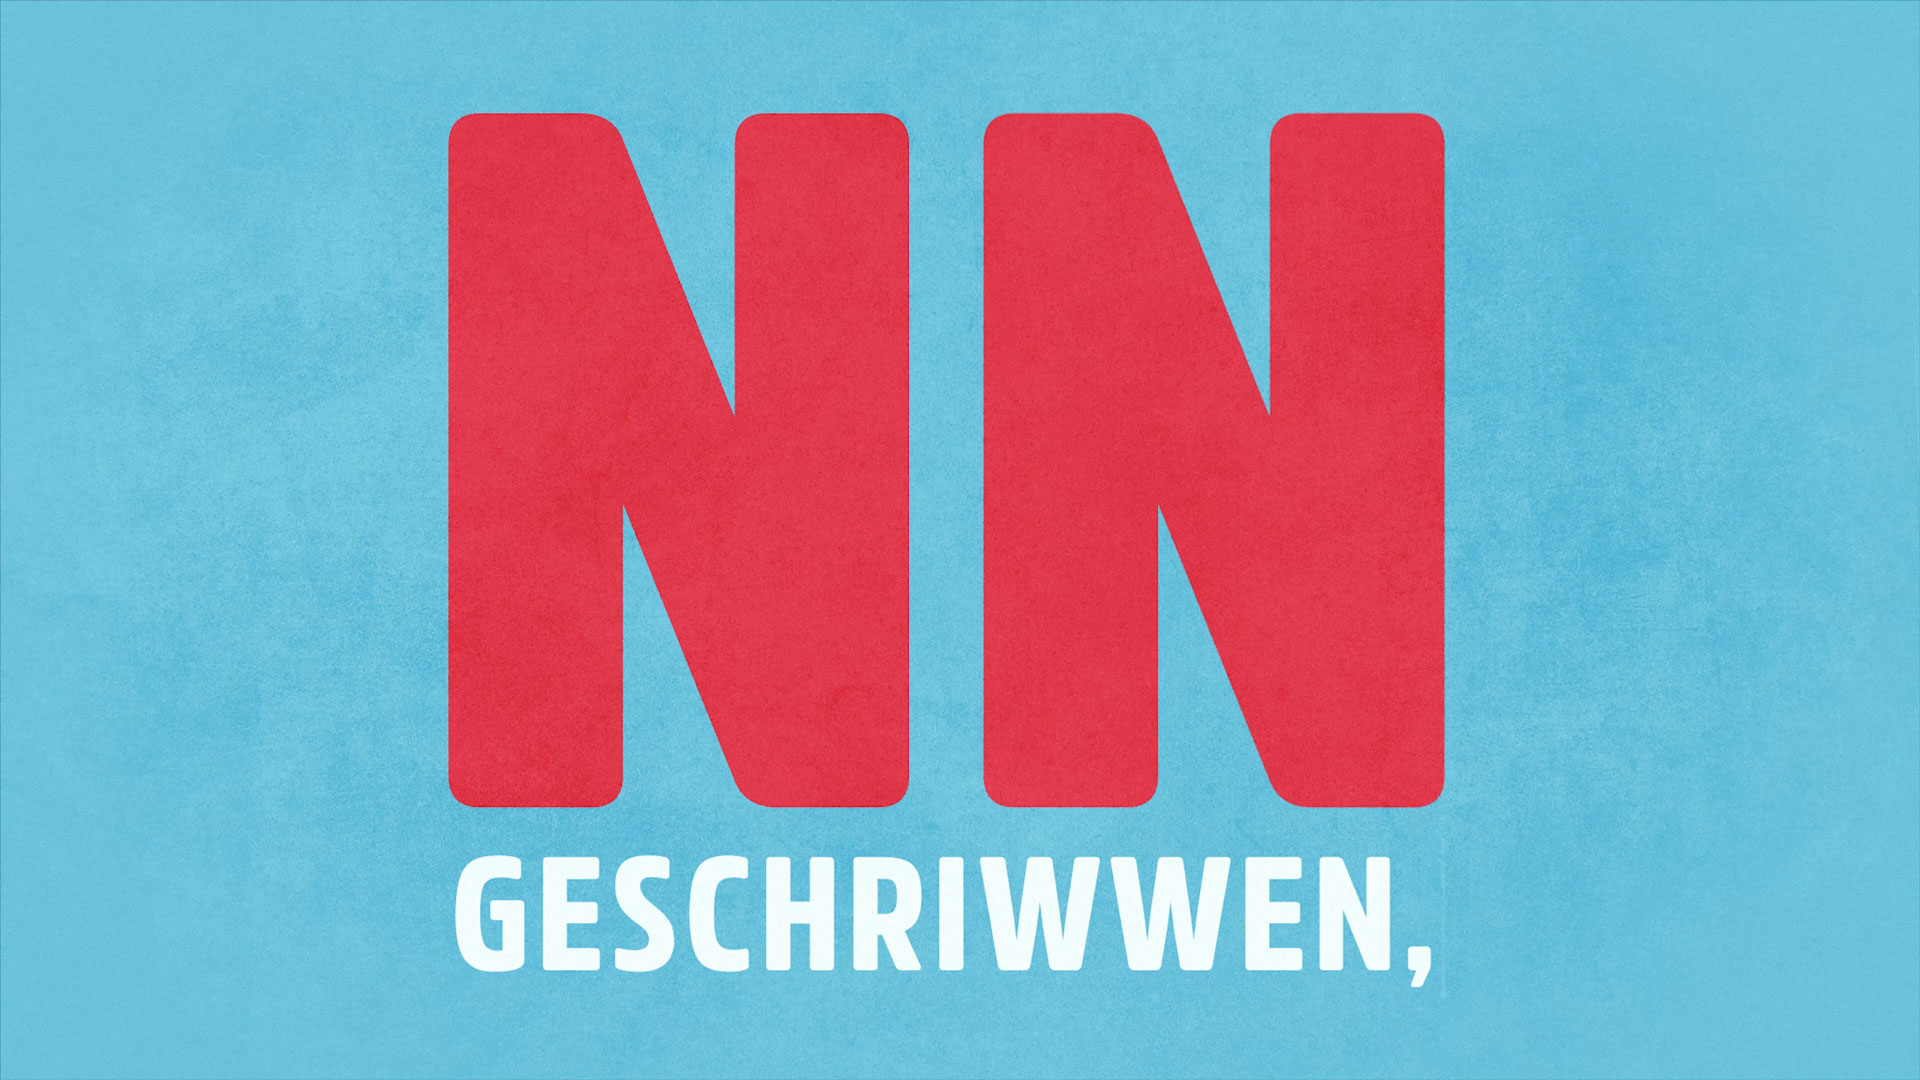 Schreiwen-lu_Film-08_4k_4